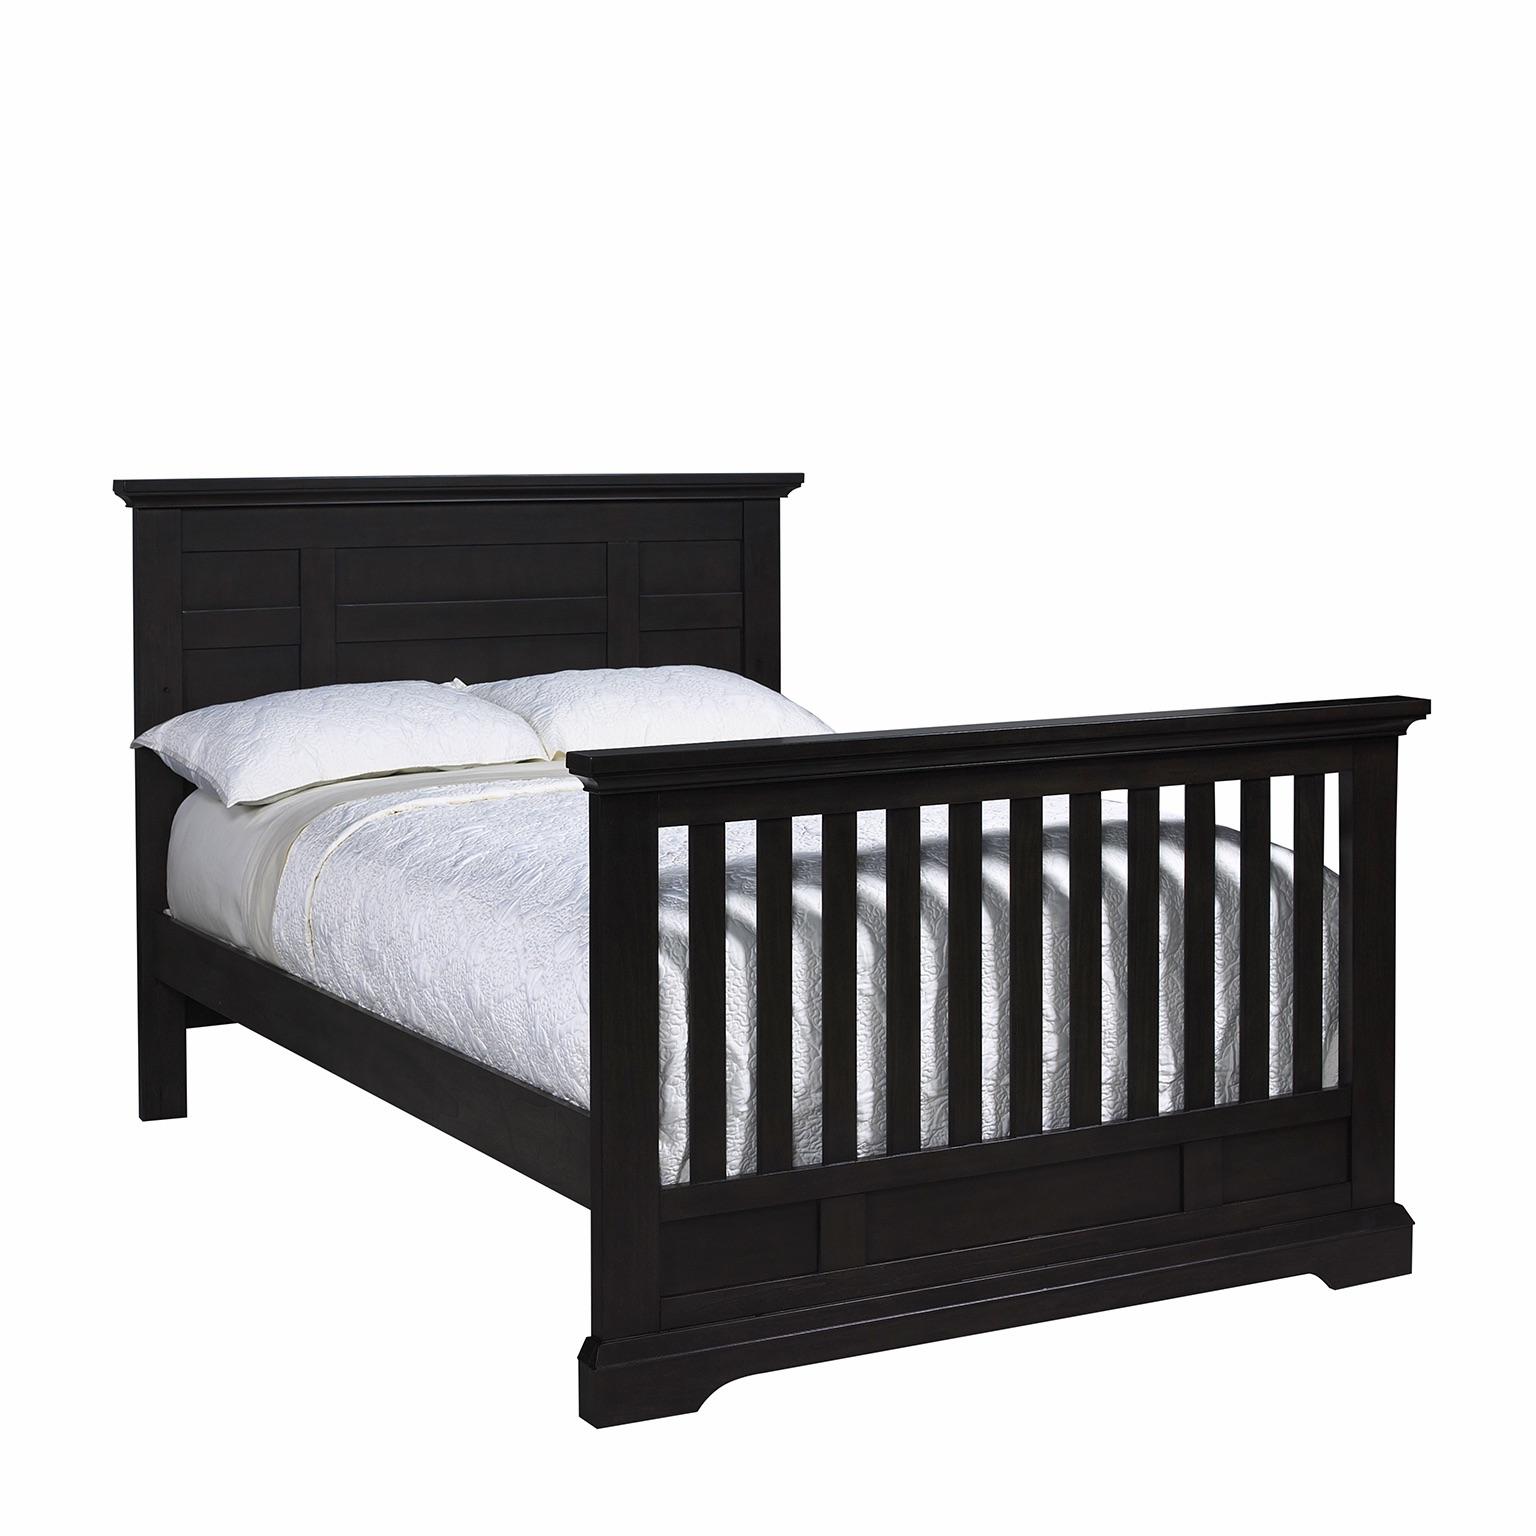 Full Bed Conversion Kit Dallas Slate Oxford Baby Amp Kids